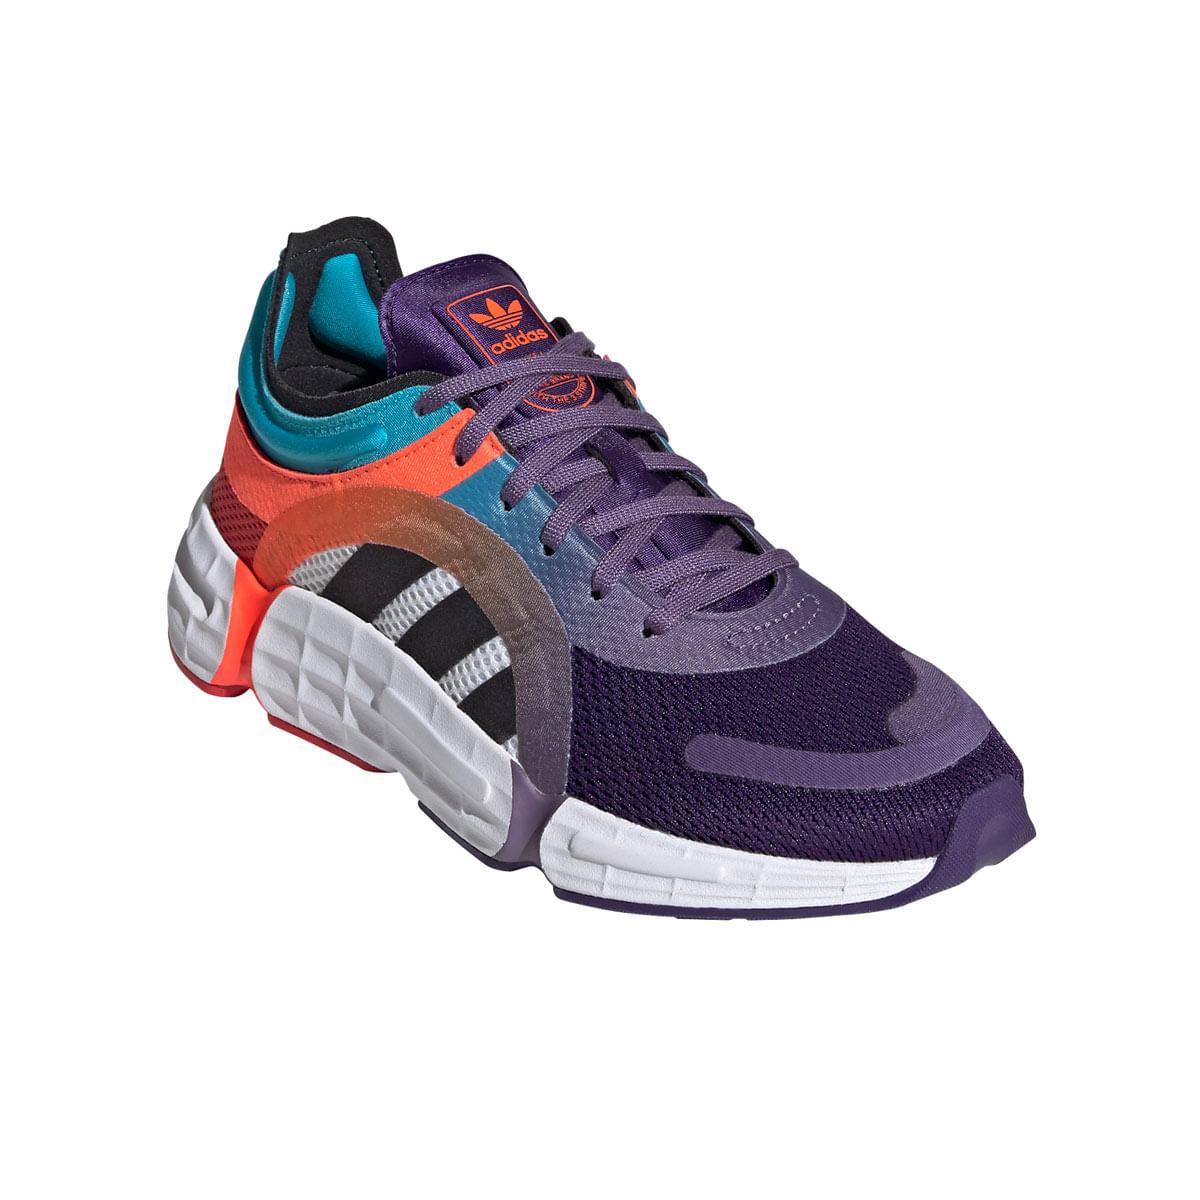 Tenis-Adidas-Soko-J--33-ao-37-FV2540--4Q20-